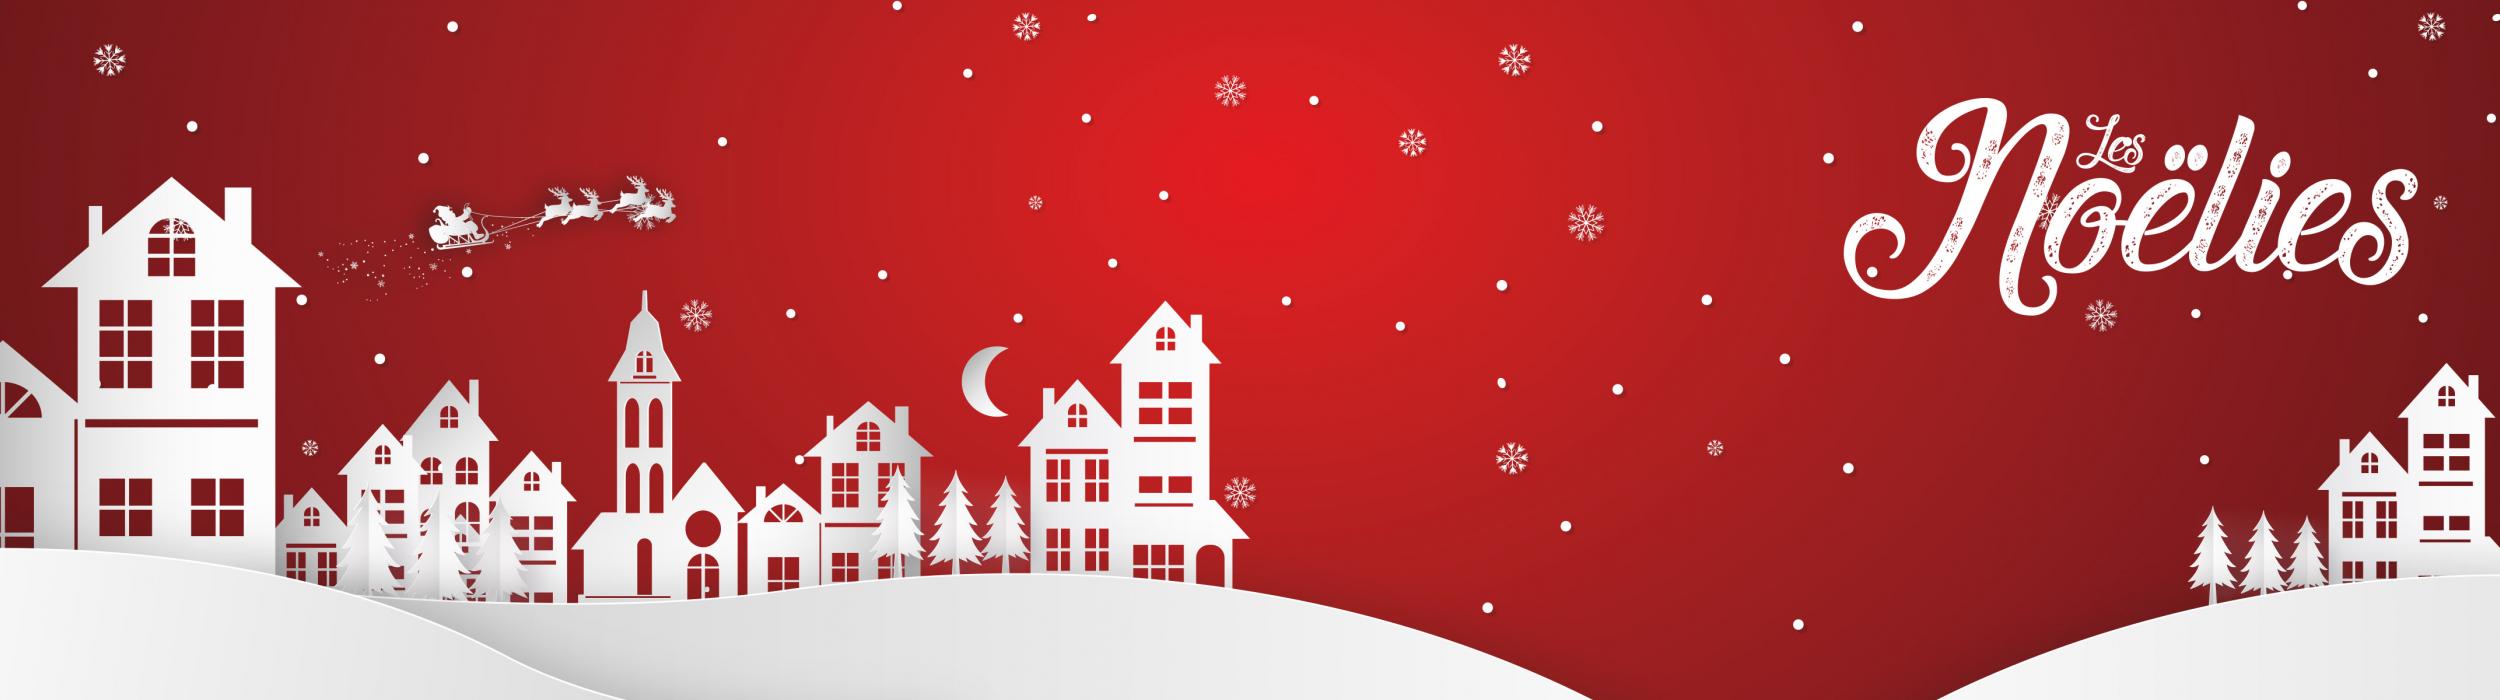 Les Noëlies